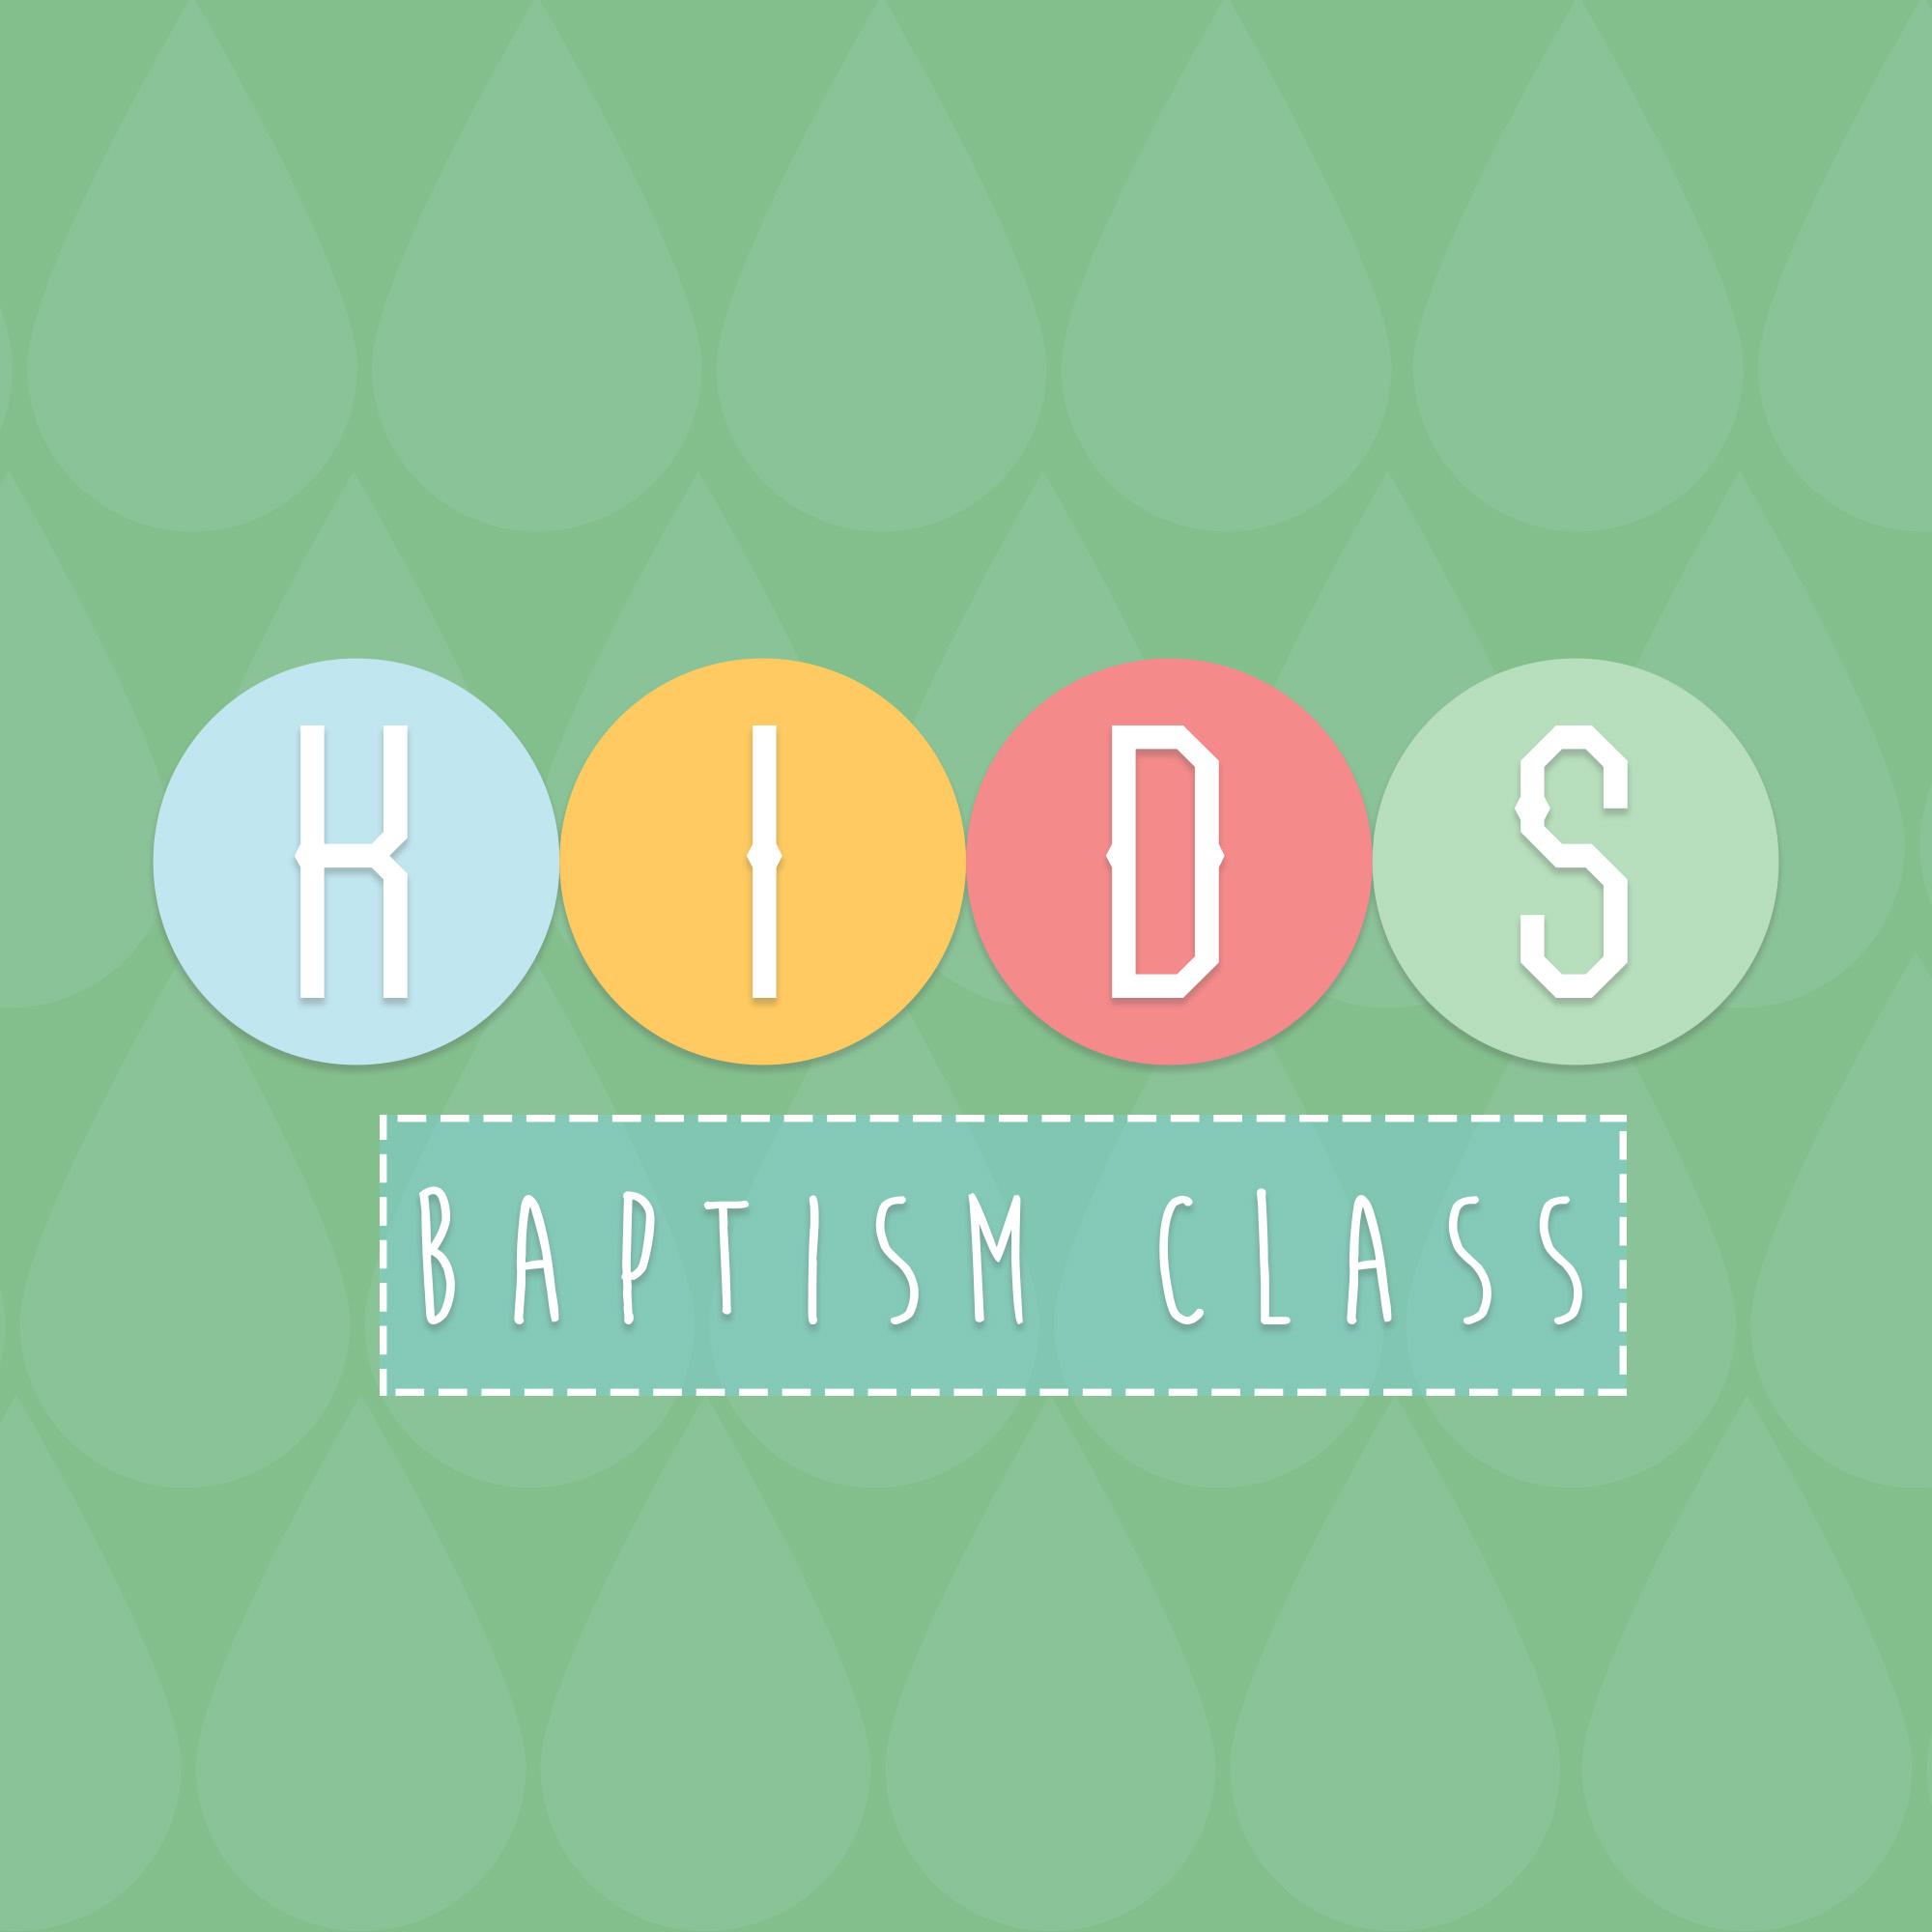 Baptism class square